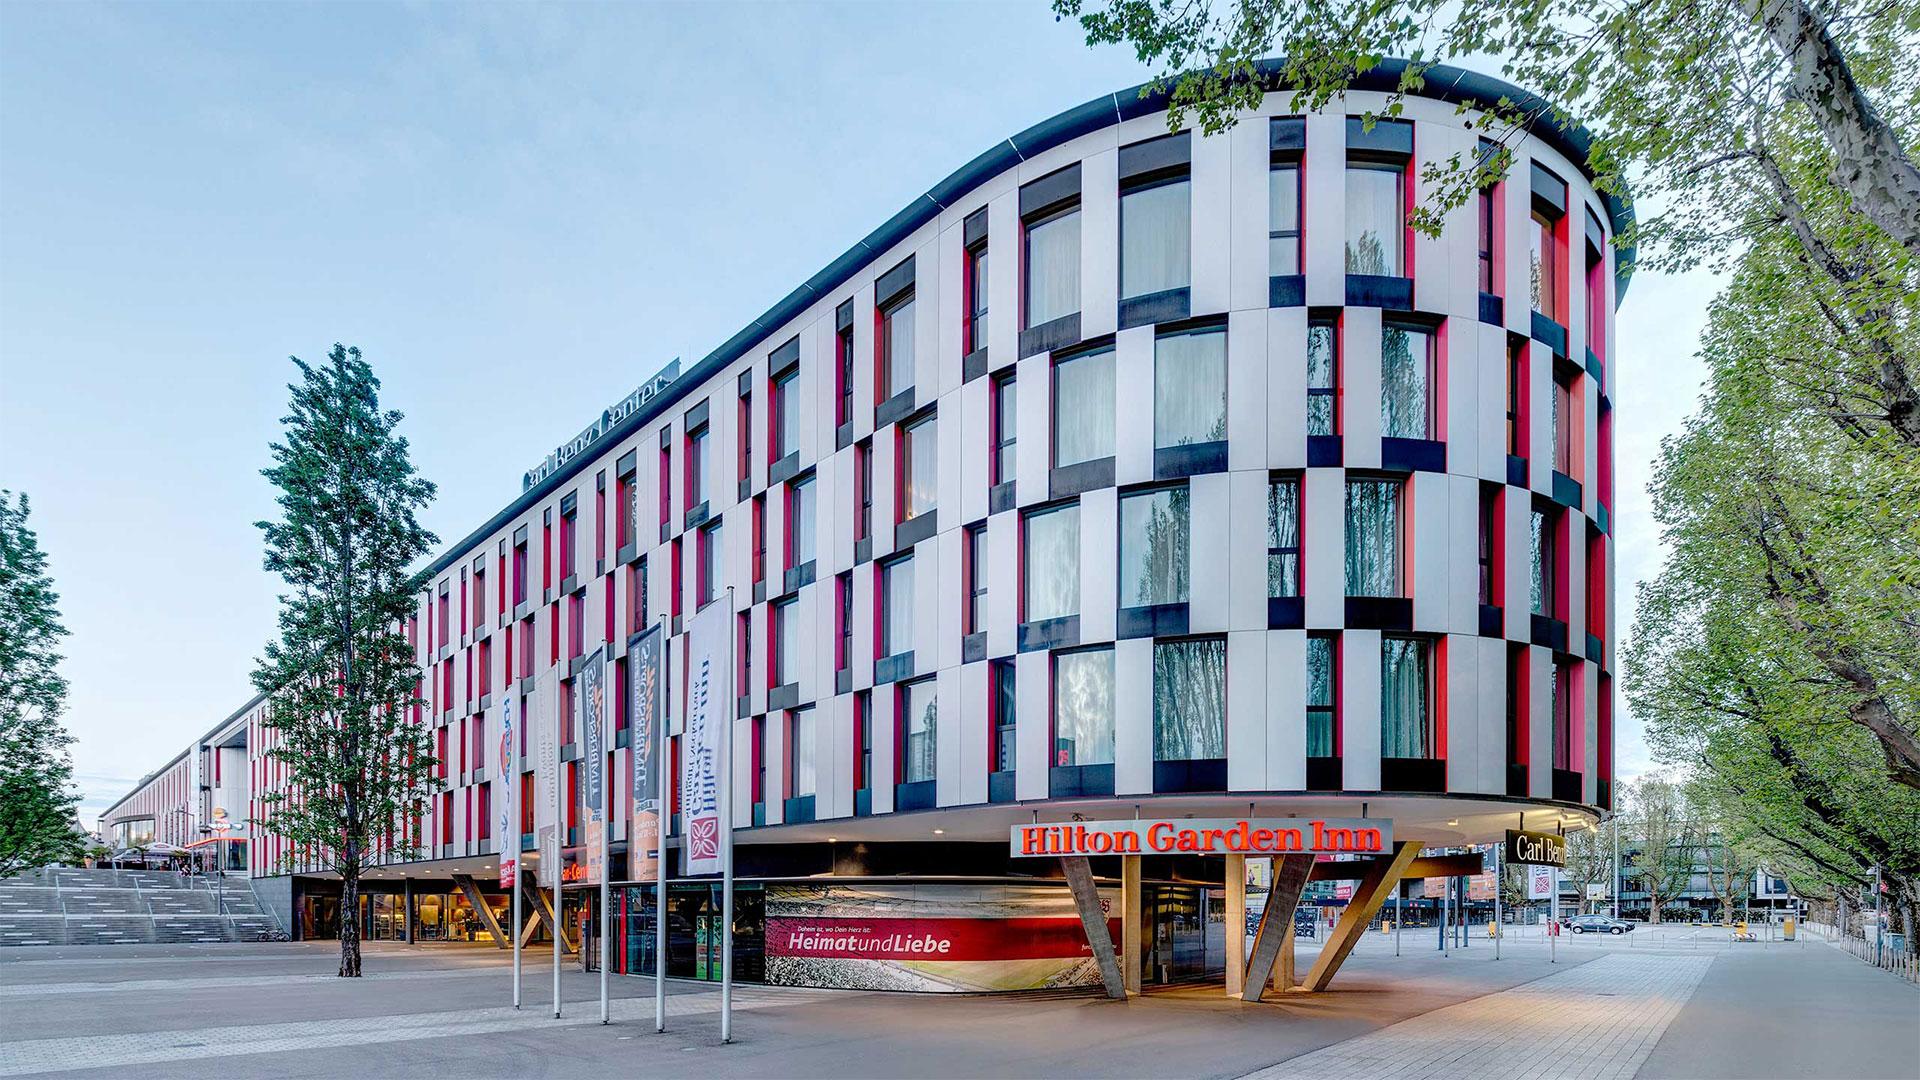 Aussenansicht -01- Hilton Garden Inn Stuttgart NeckarPark